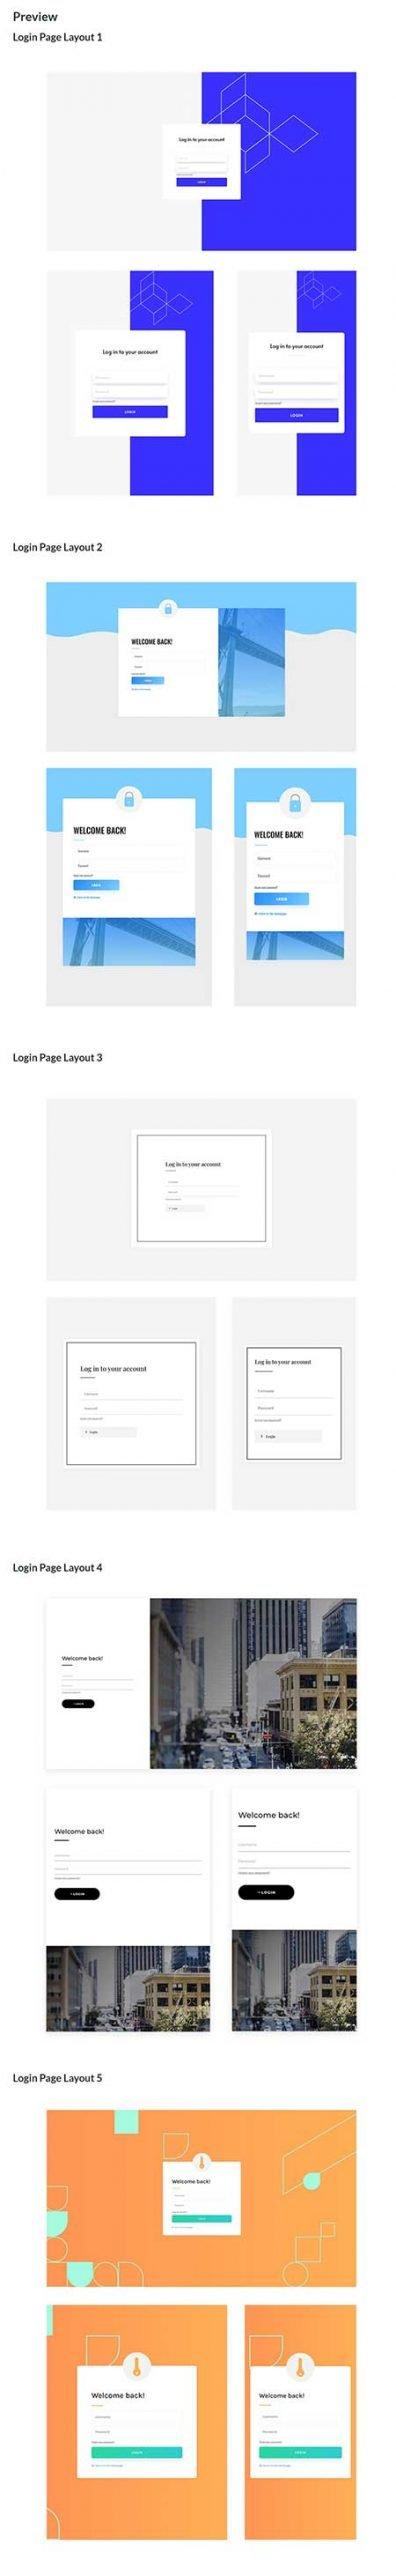 Divi custom login page template